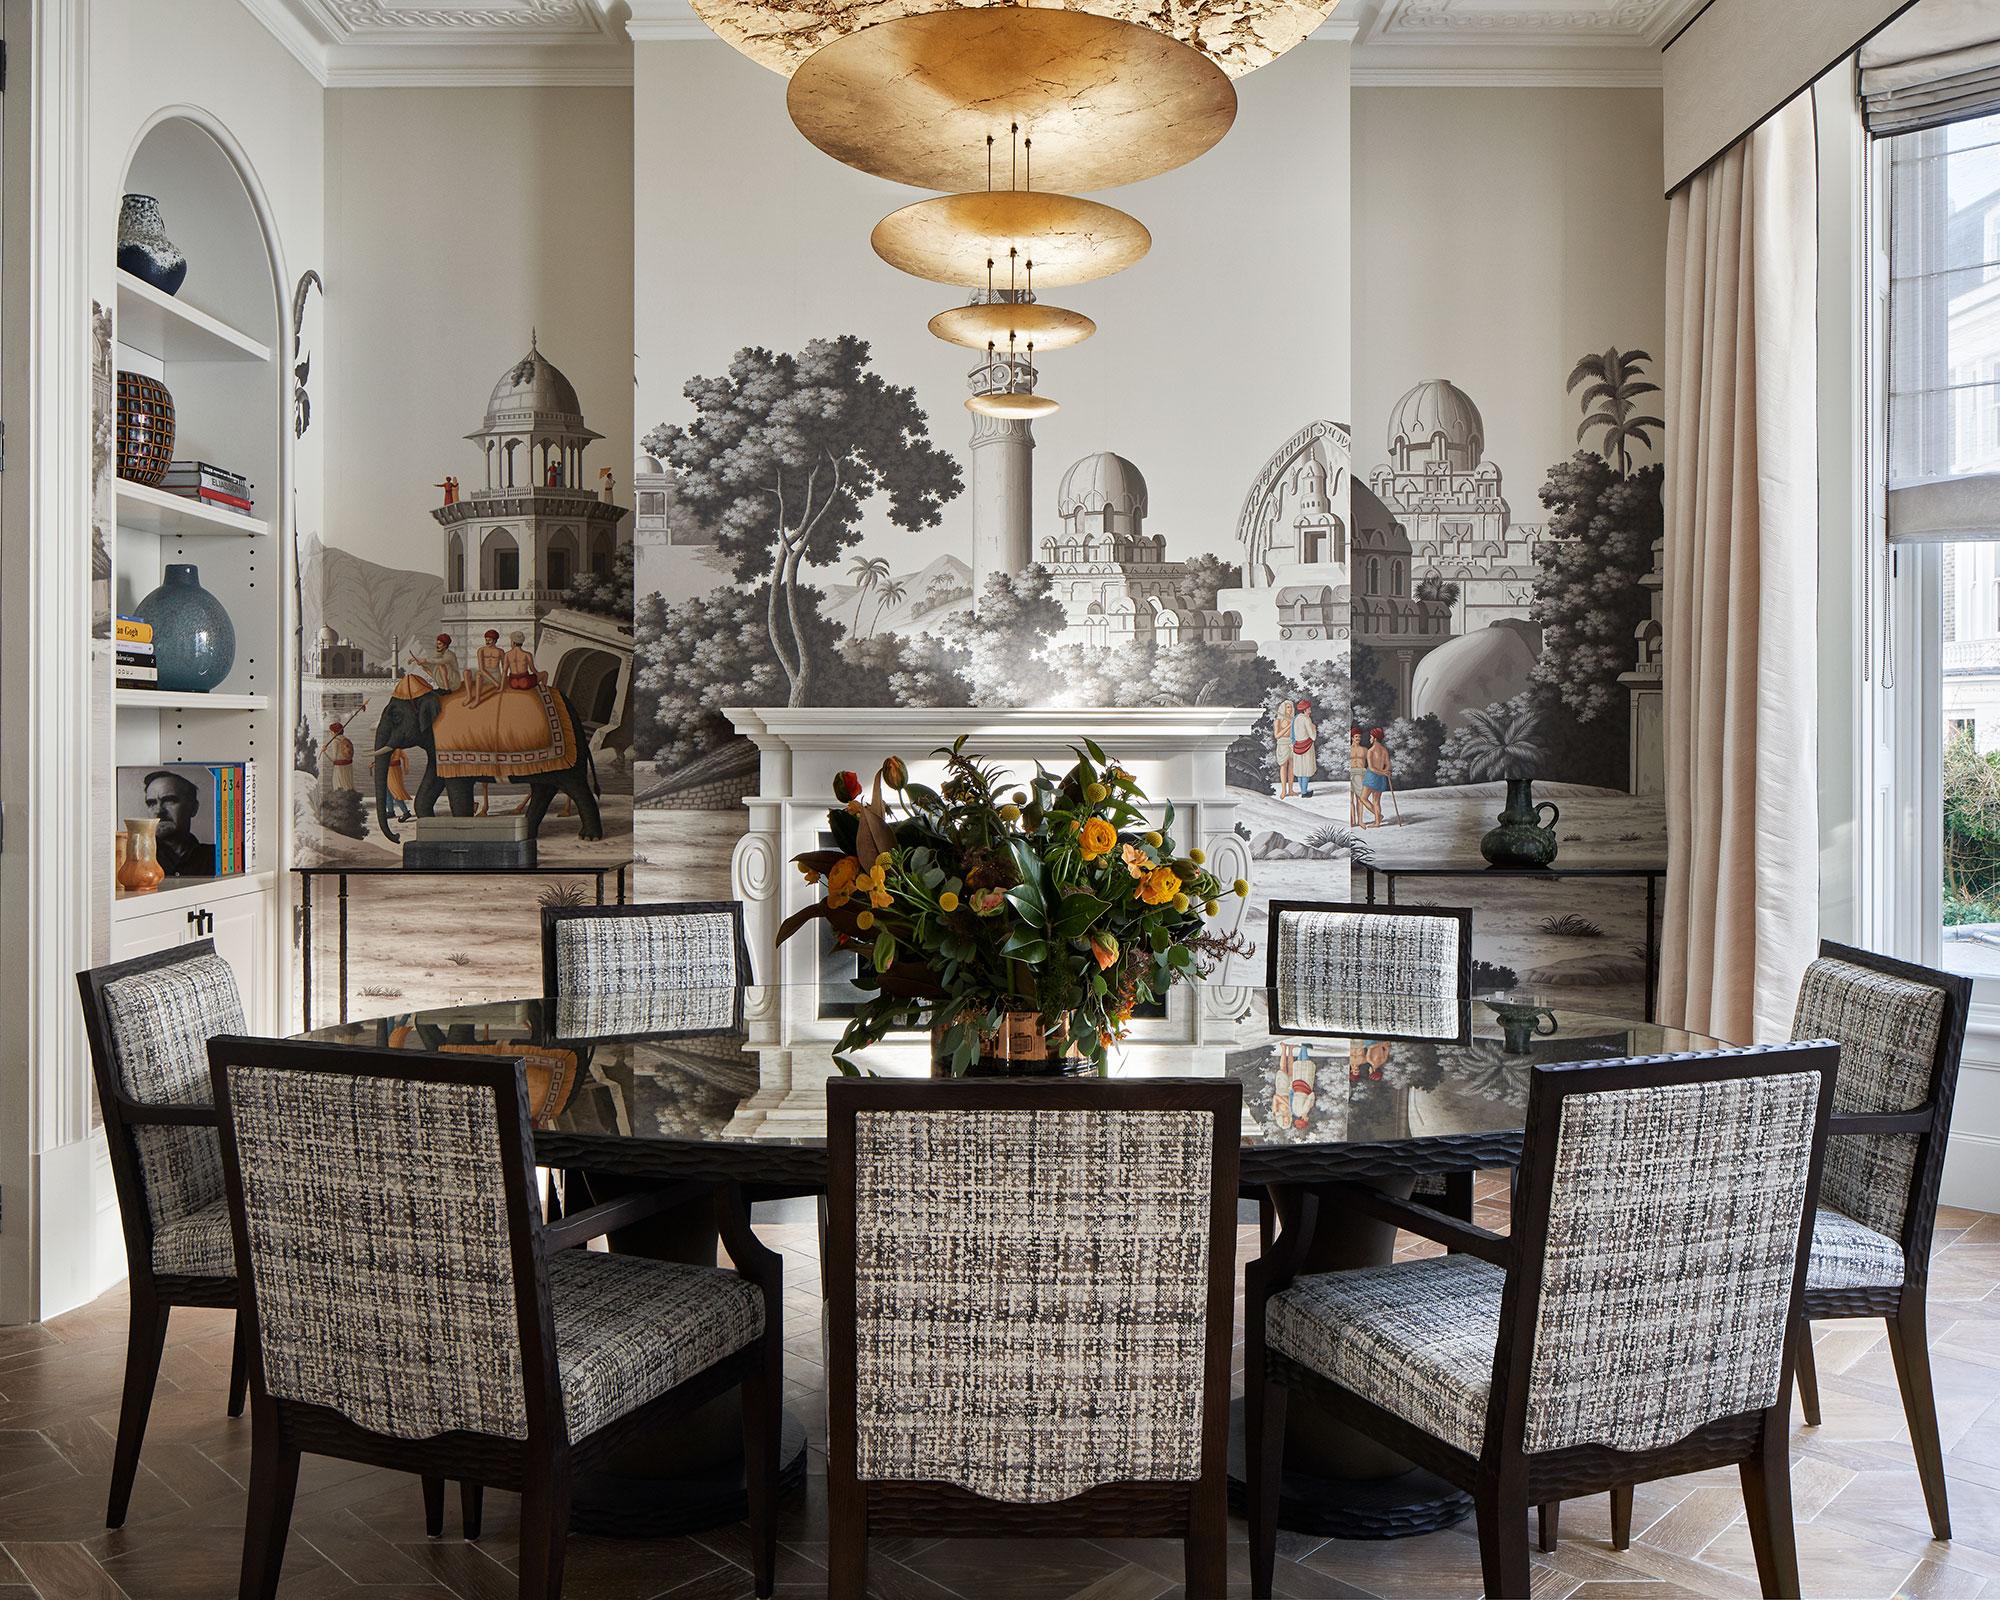 Wallpaper Ideas Inspiration For, Dining Room Wallcovering Ideas